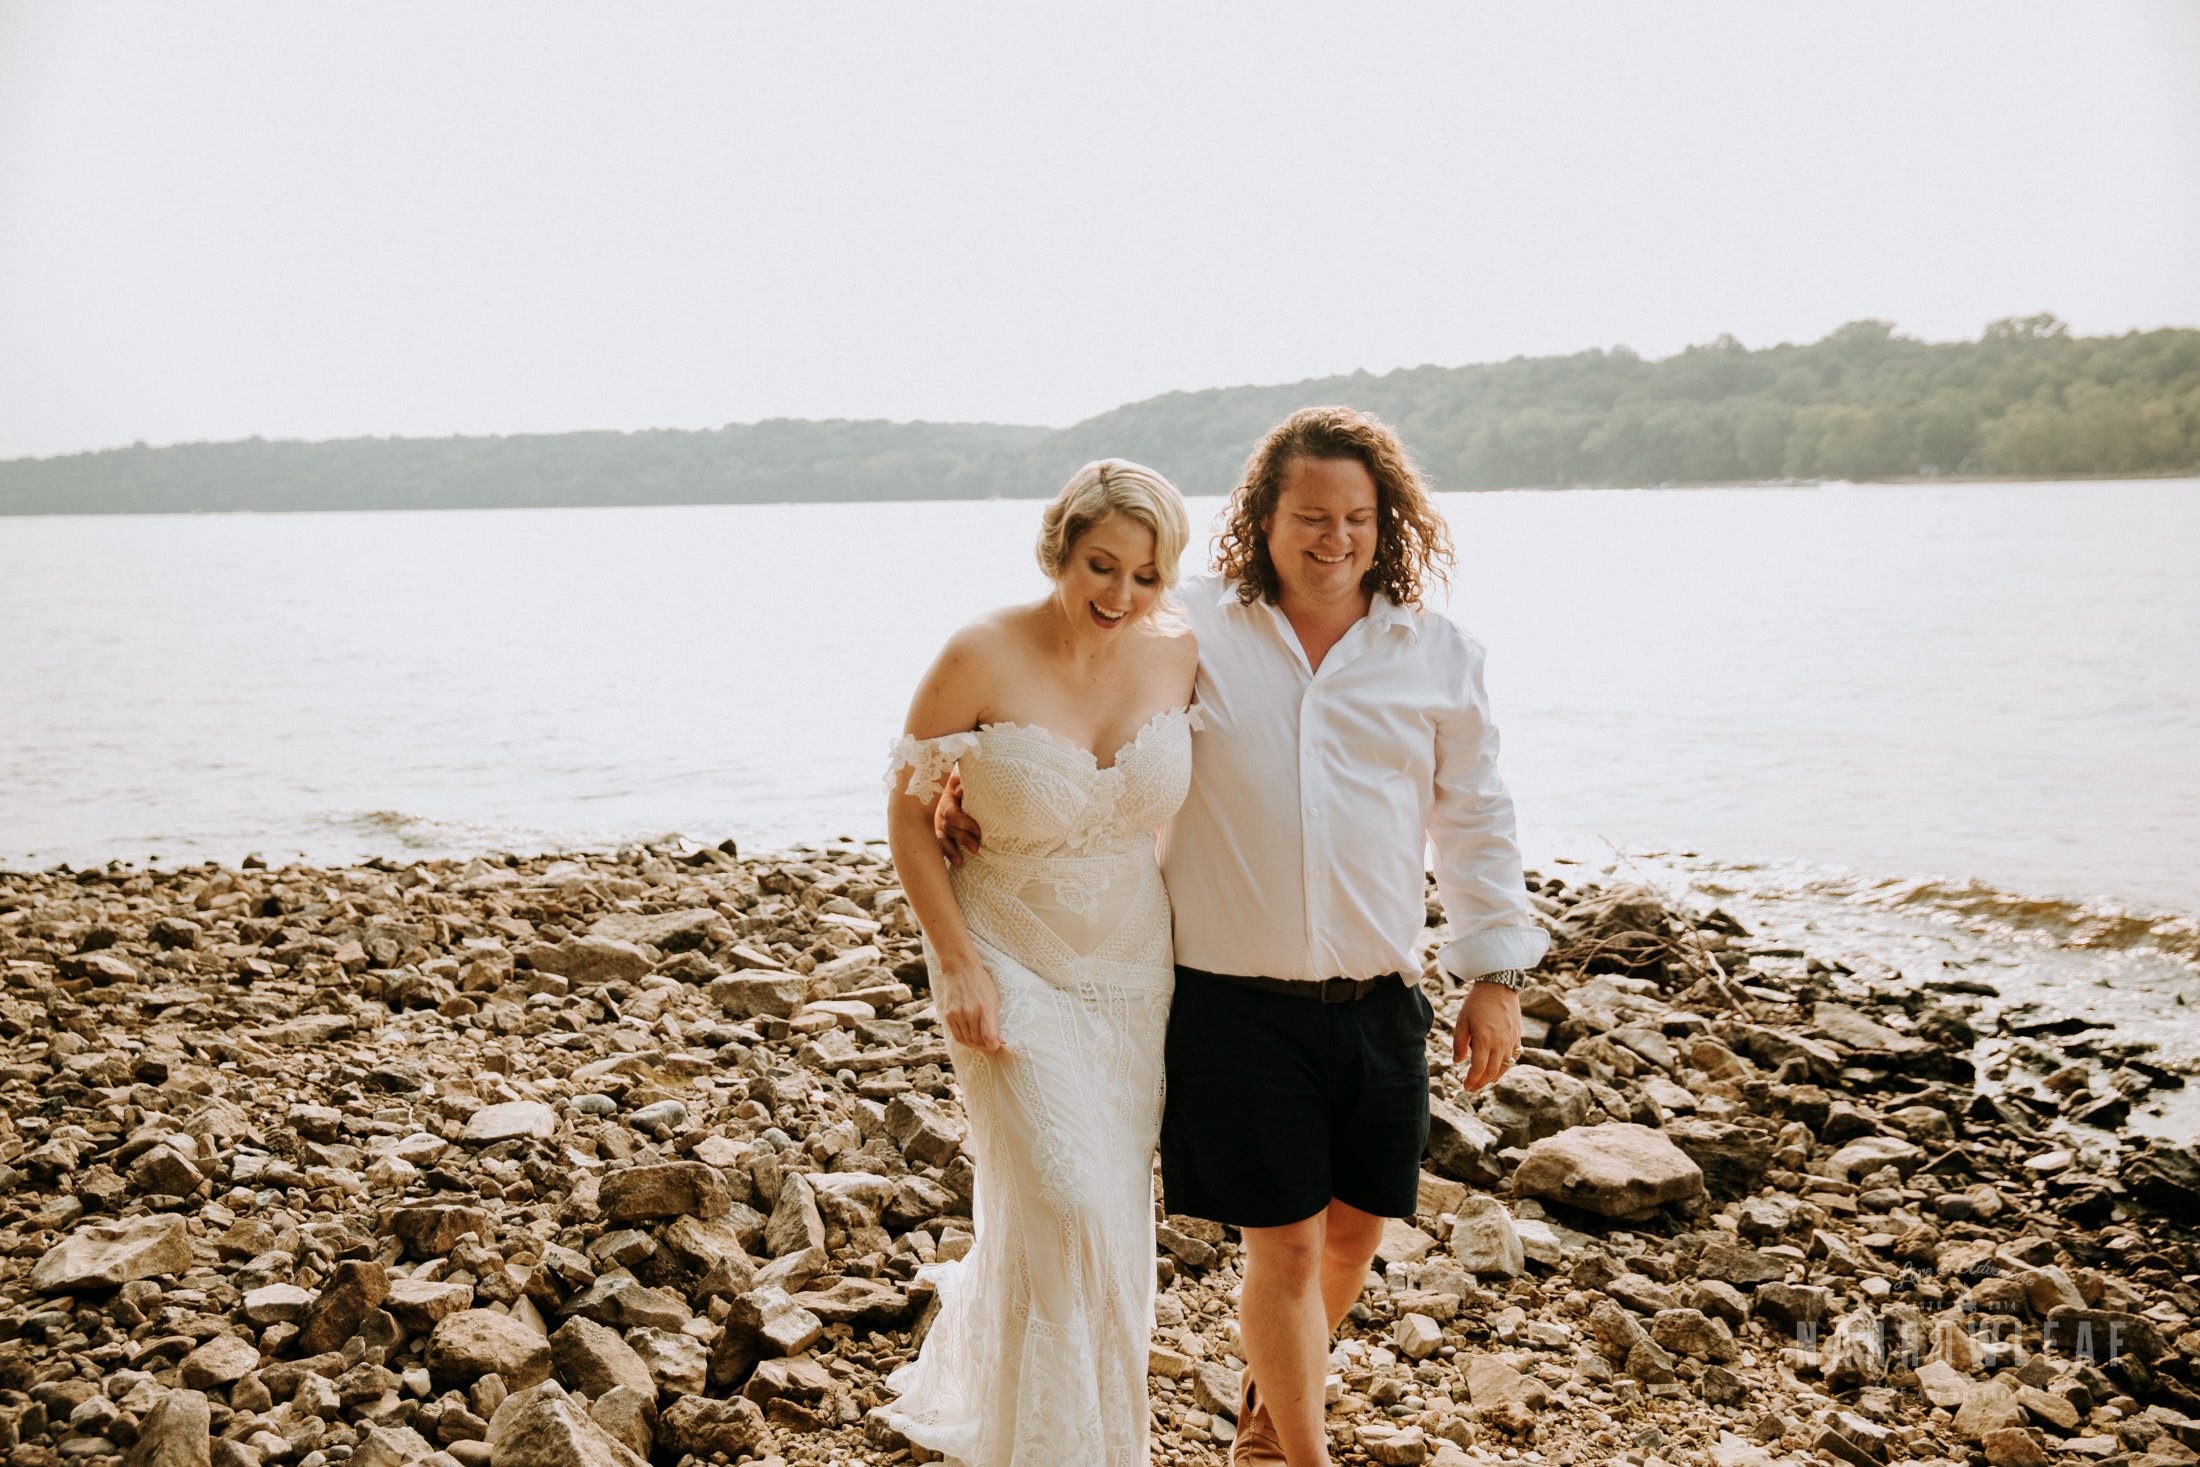 wisconsin-wedding-photographer-Narrowleaf_Love_and_Adventure_Photography-3771.jpg